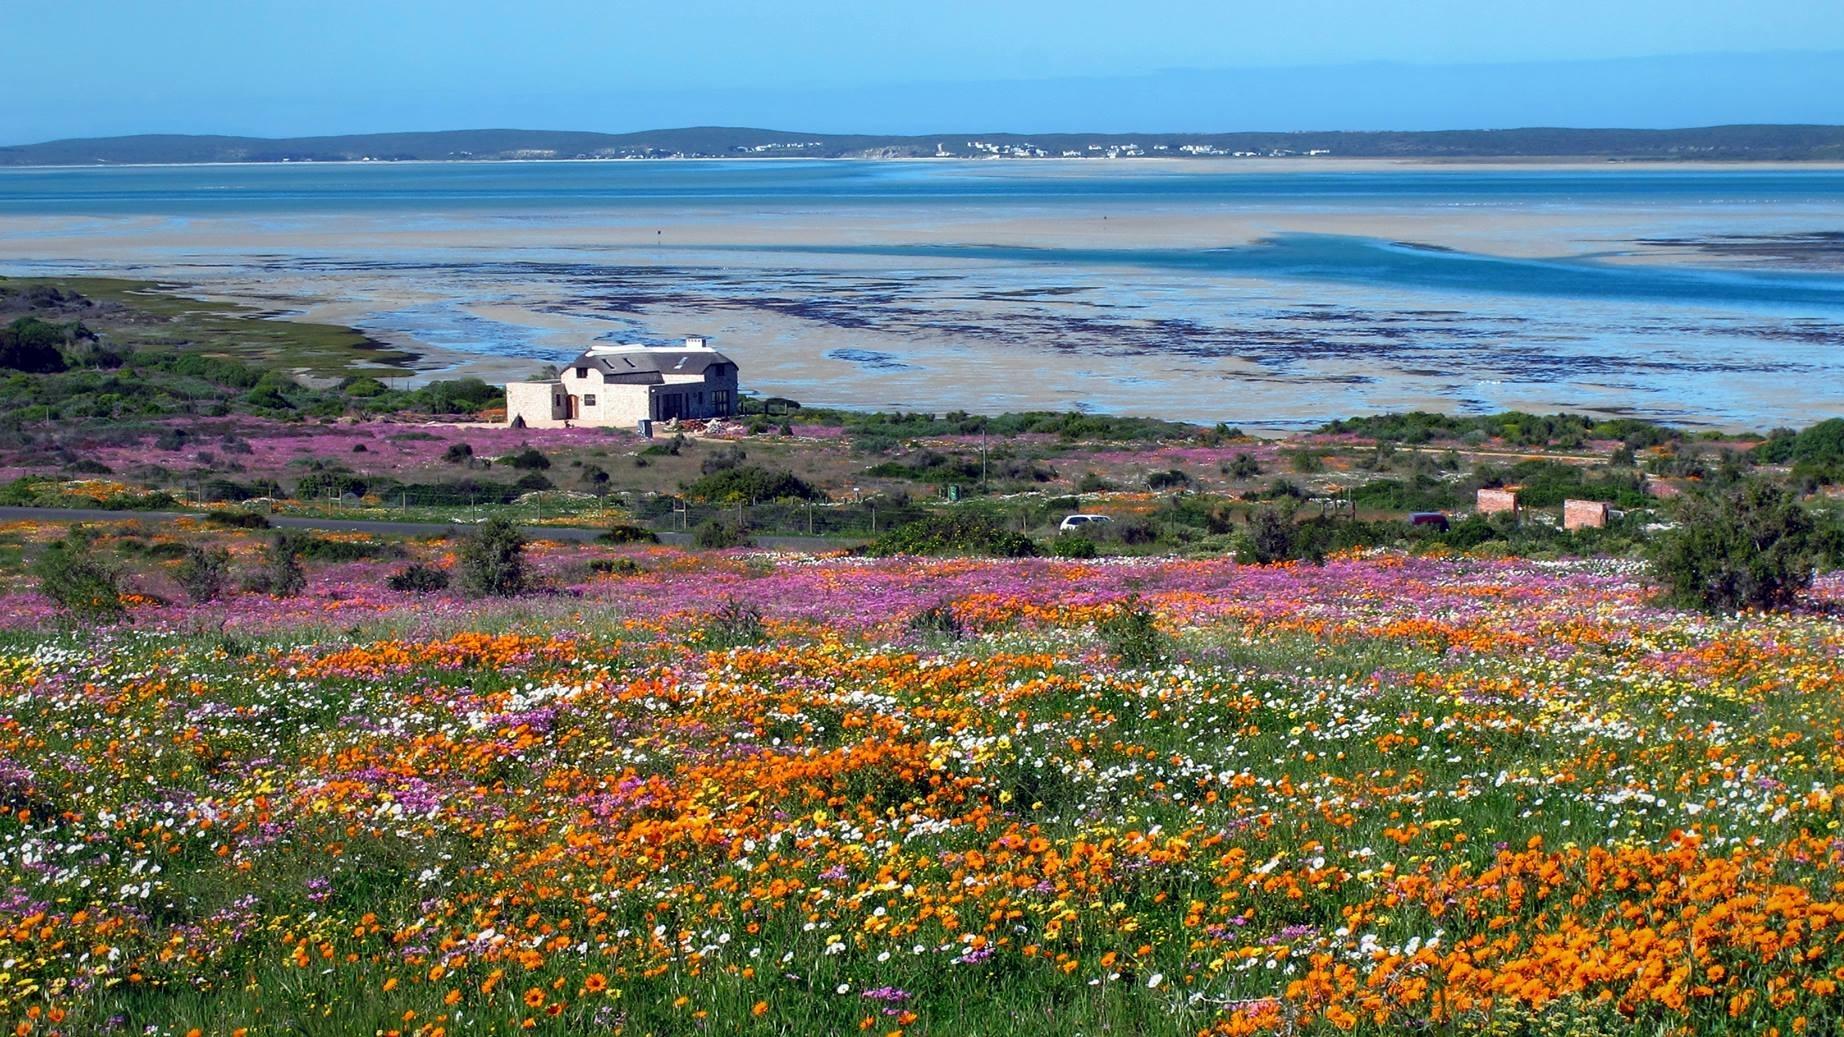 west-coast-national-park-postberg-flowers